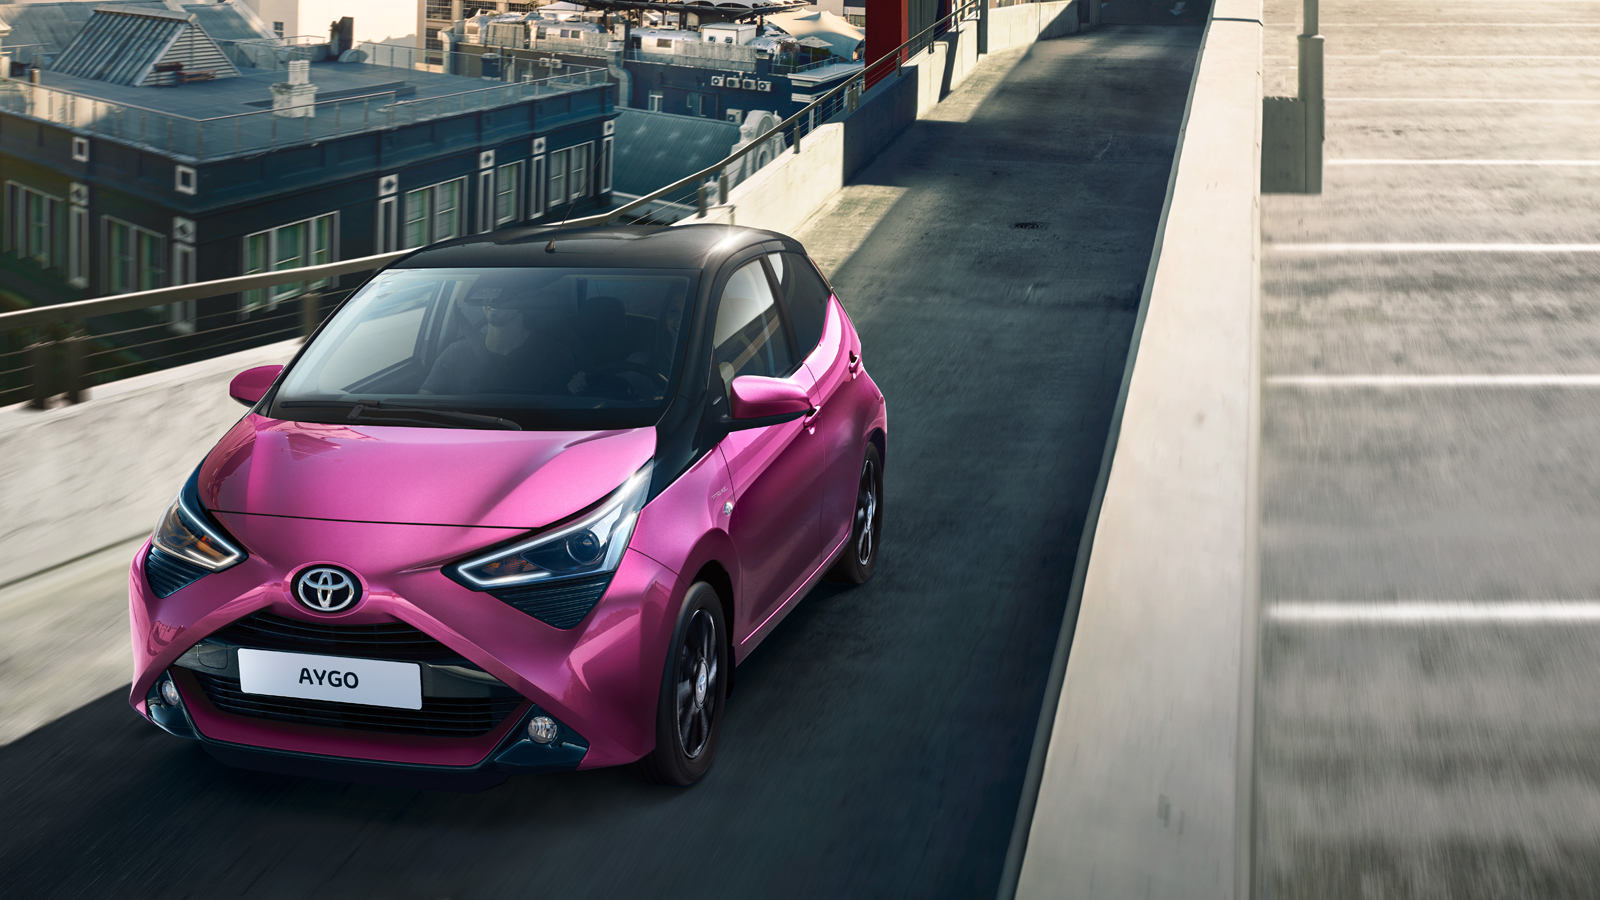 b1bbda8ea0 Toyota - Nové AYGO - Premiéra v 2018 roku